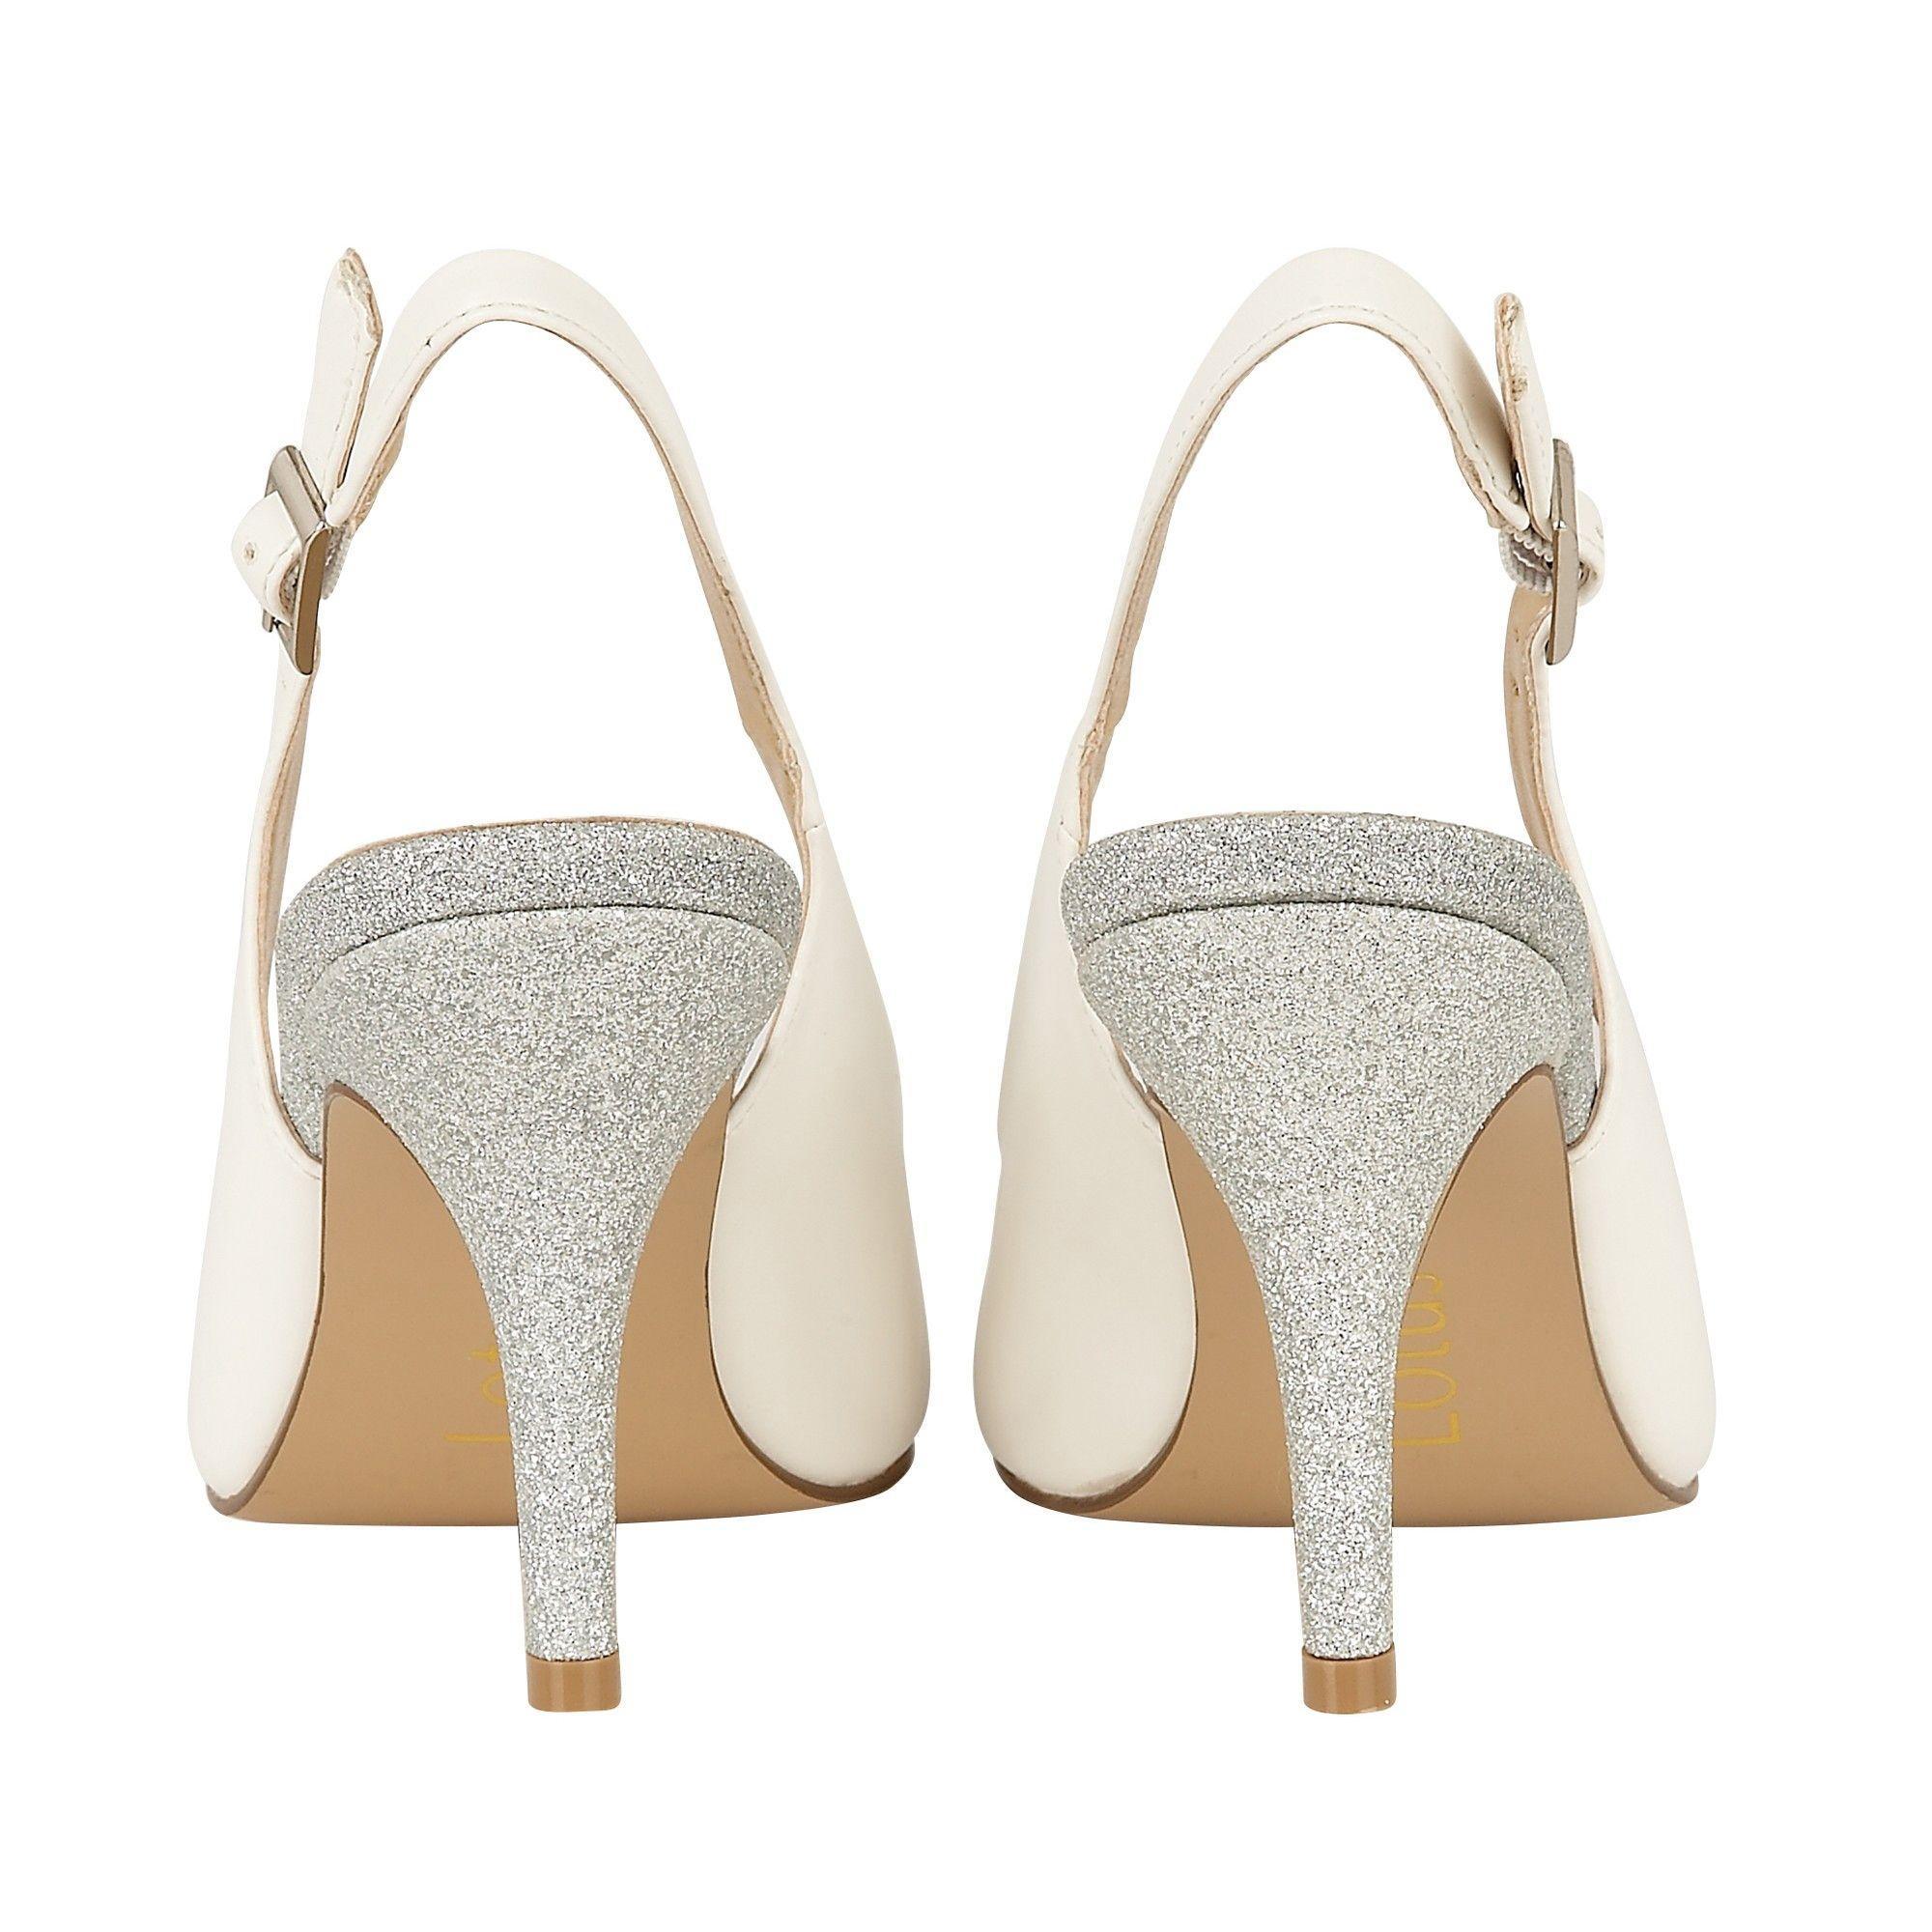 ab468272cf Lotus - White Glitter 'arlind' High Stiletto Heel Slingbacks - Lyst. View  fullscreen